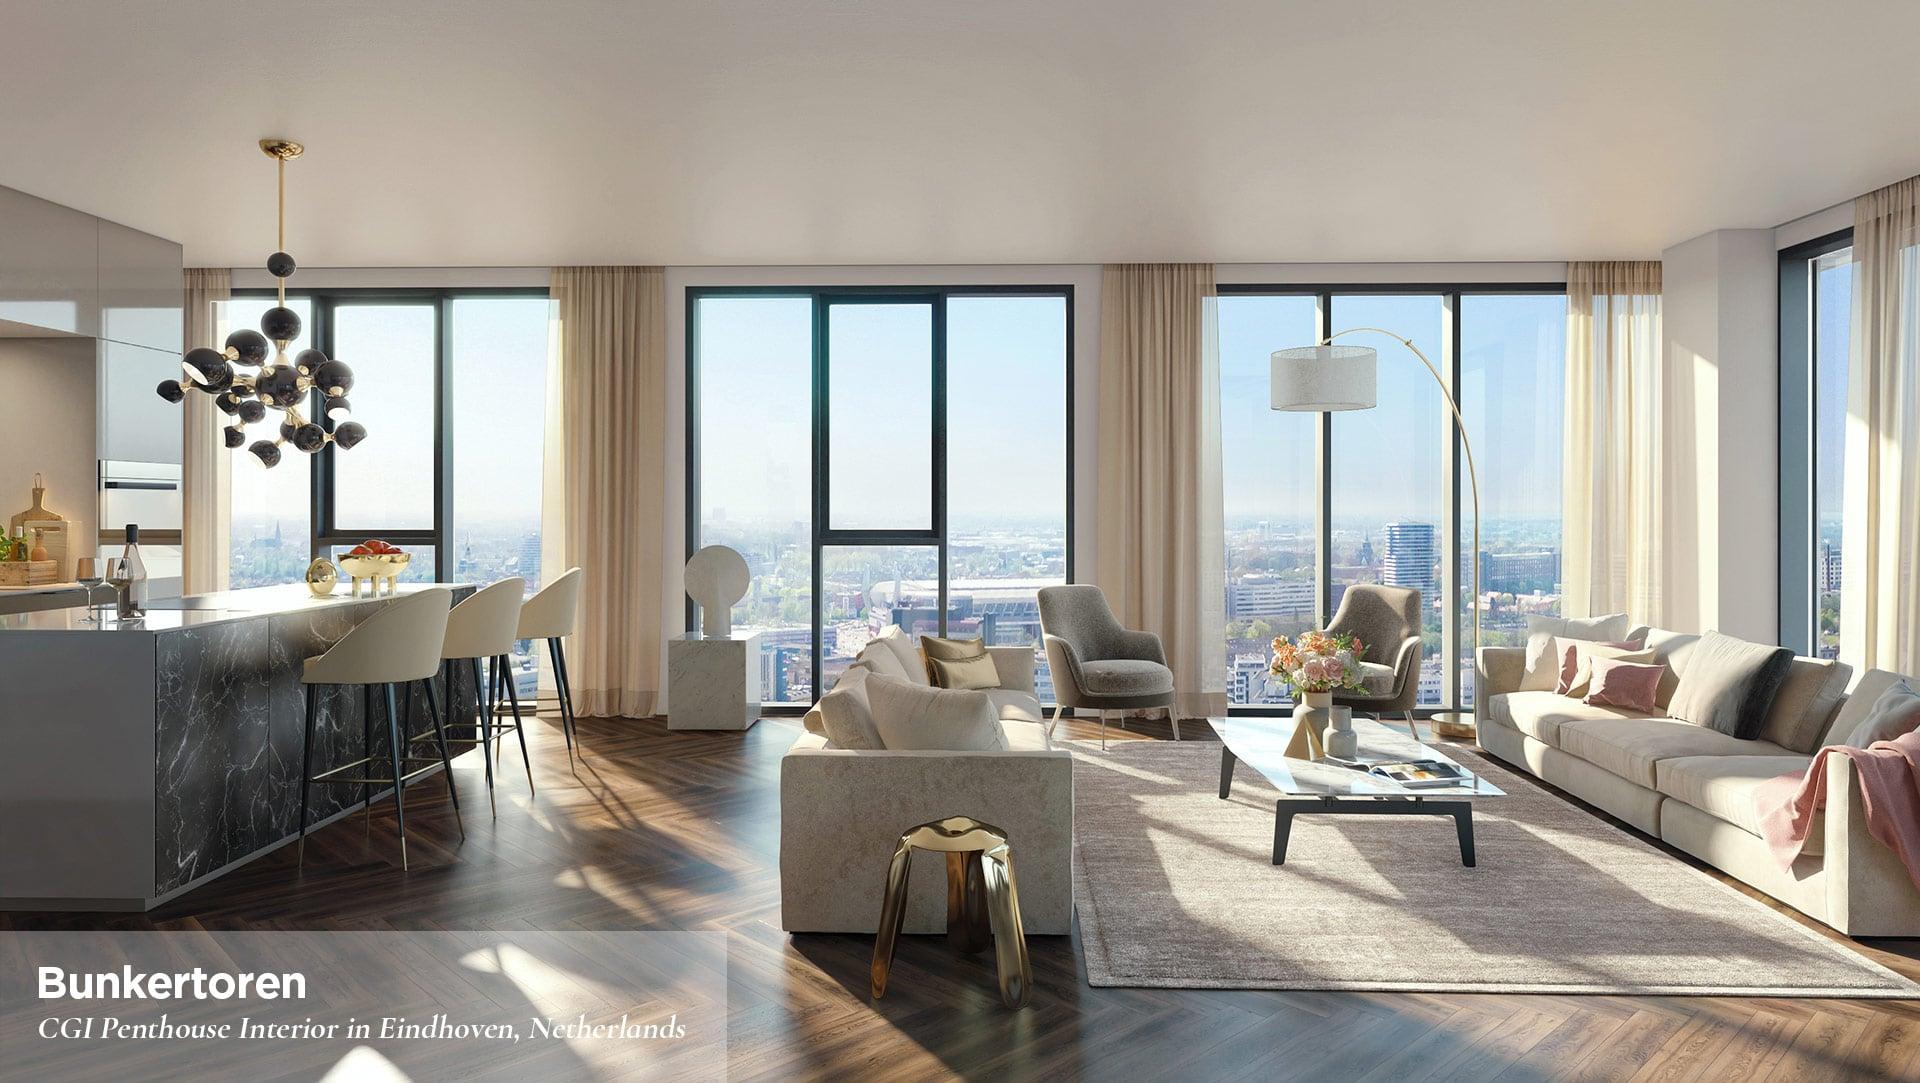 cgi-penthouse-interior-residential-powerhouse-company-bunkertoren-eindhoven-copyright-kaiserbold-com